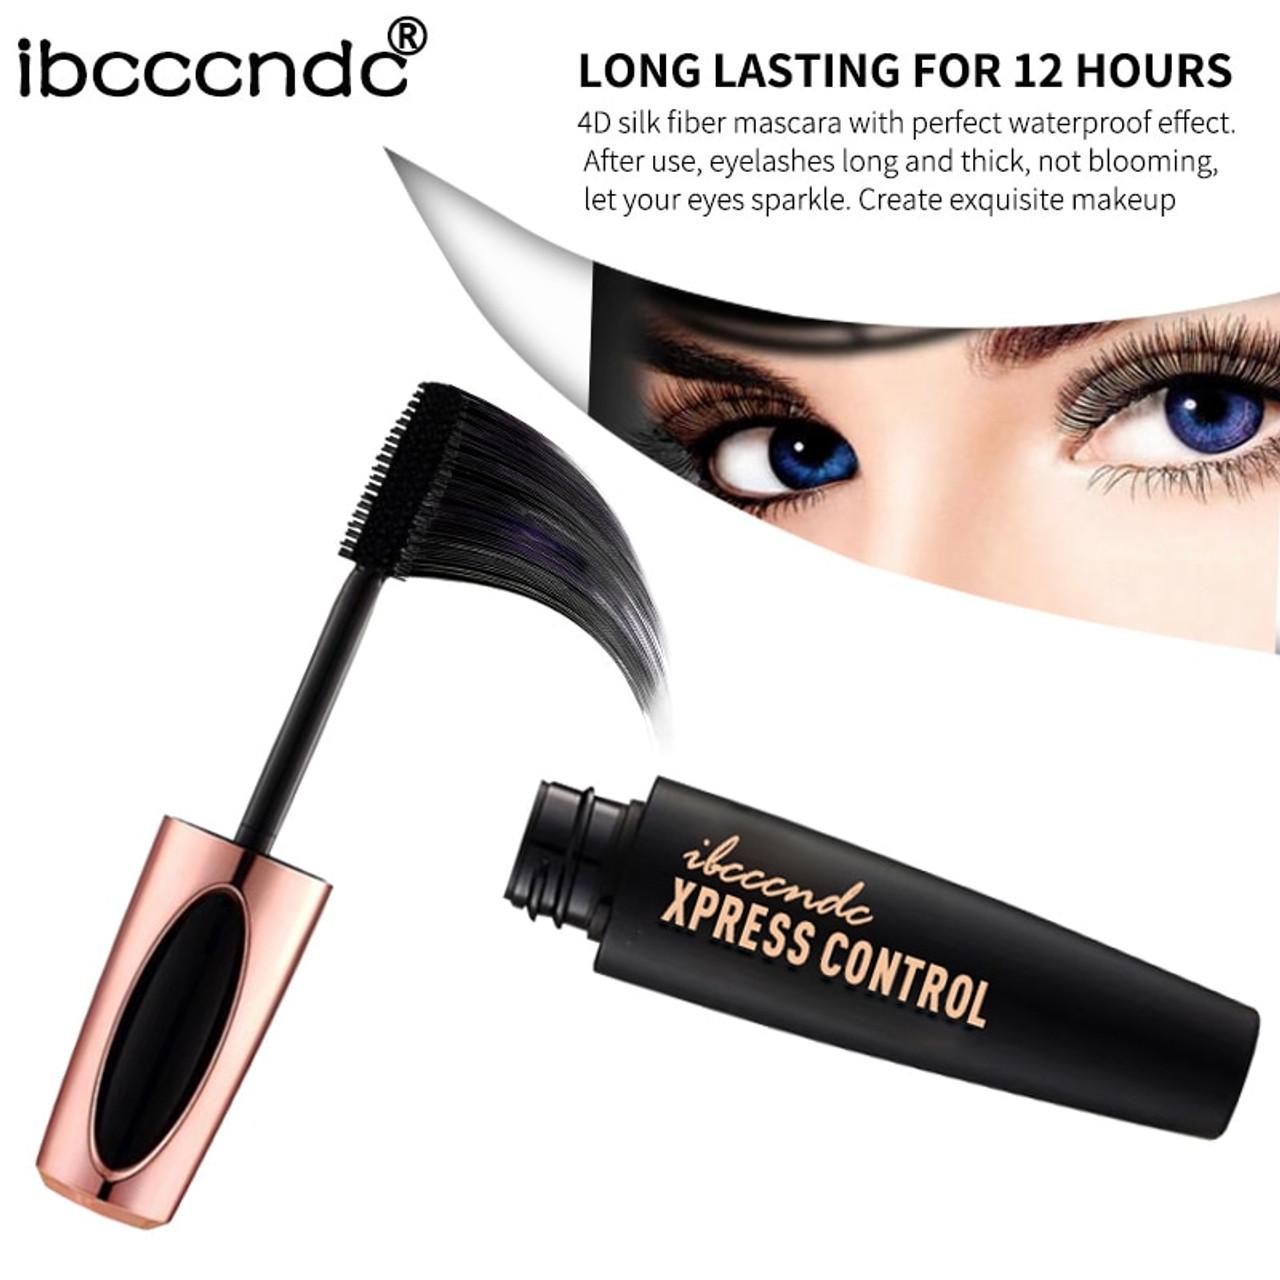 f5e40ddebf1 ... New 4D Silk Fiber Lash Mascara Waterproof Rimel 3d Mascara For Eyelash  Extension Black Thick Lengthening ...